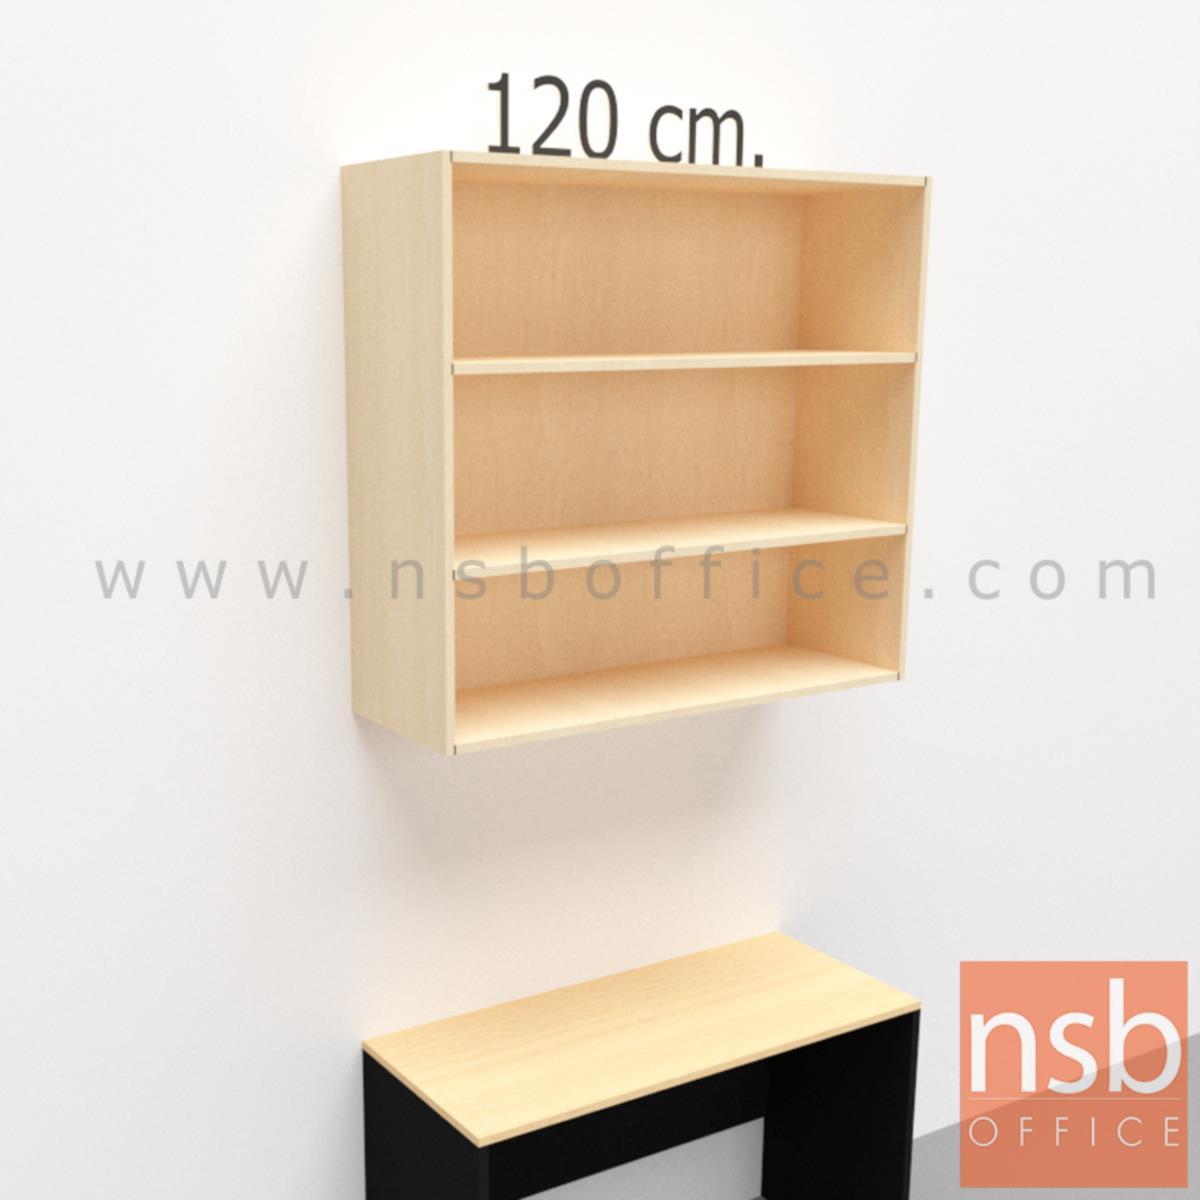 C06A057:ตู้แขวนลอย ช่องโล่ง 3 ช่องวางแฟ้ม รุ่น Pentz (เพนซ์) 80W ,120W ,150W*110H cm.  เมลามีน